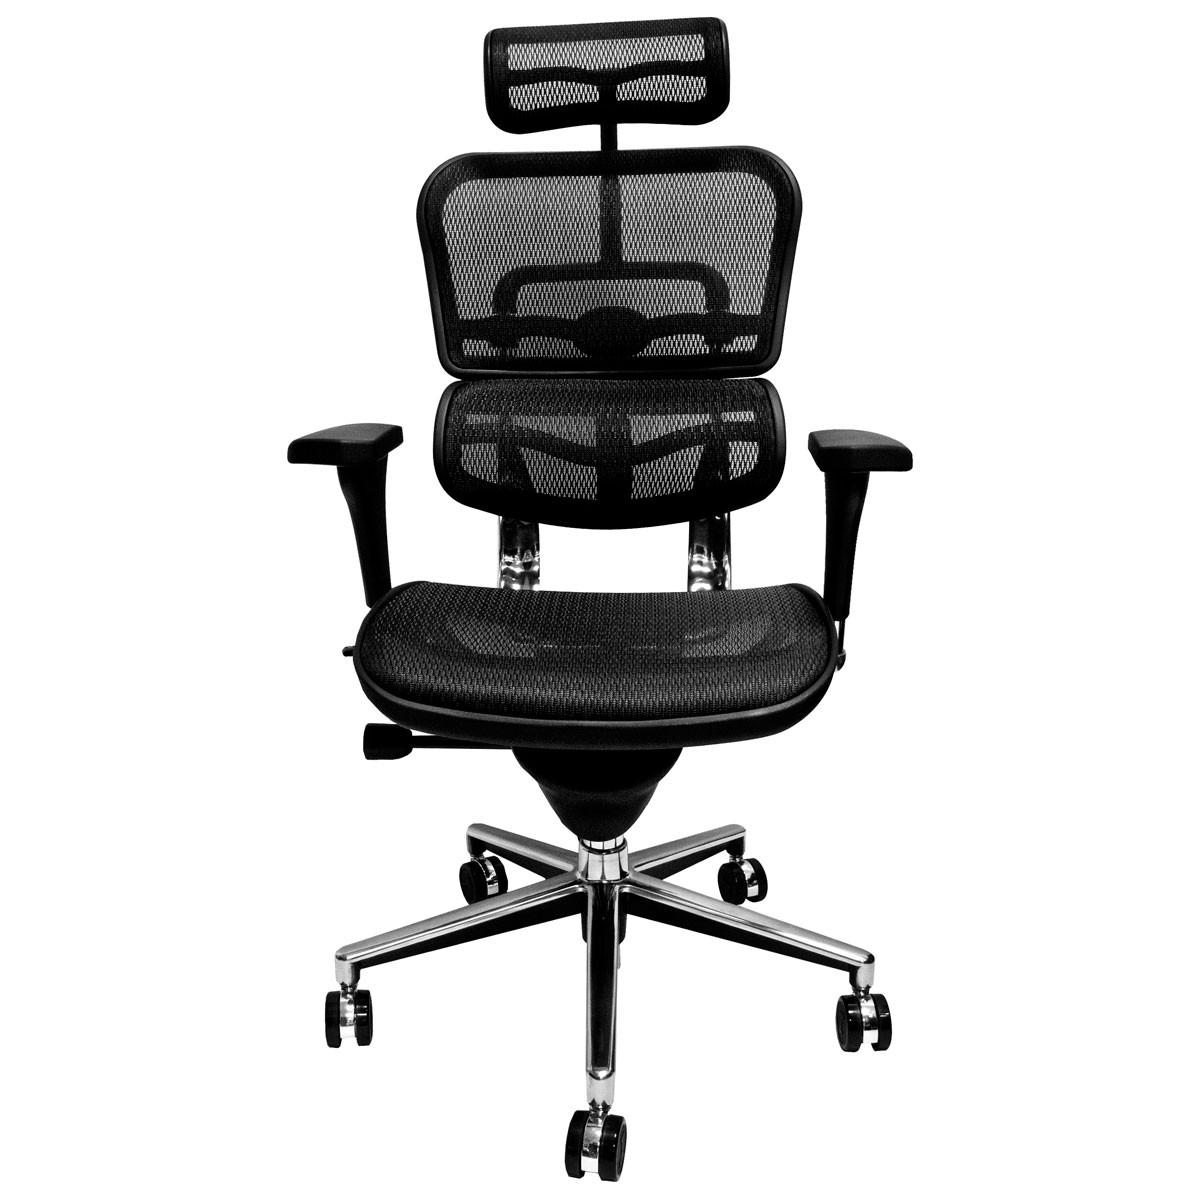 ergohuman me7erg mesh high back chair - Ergohuman